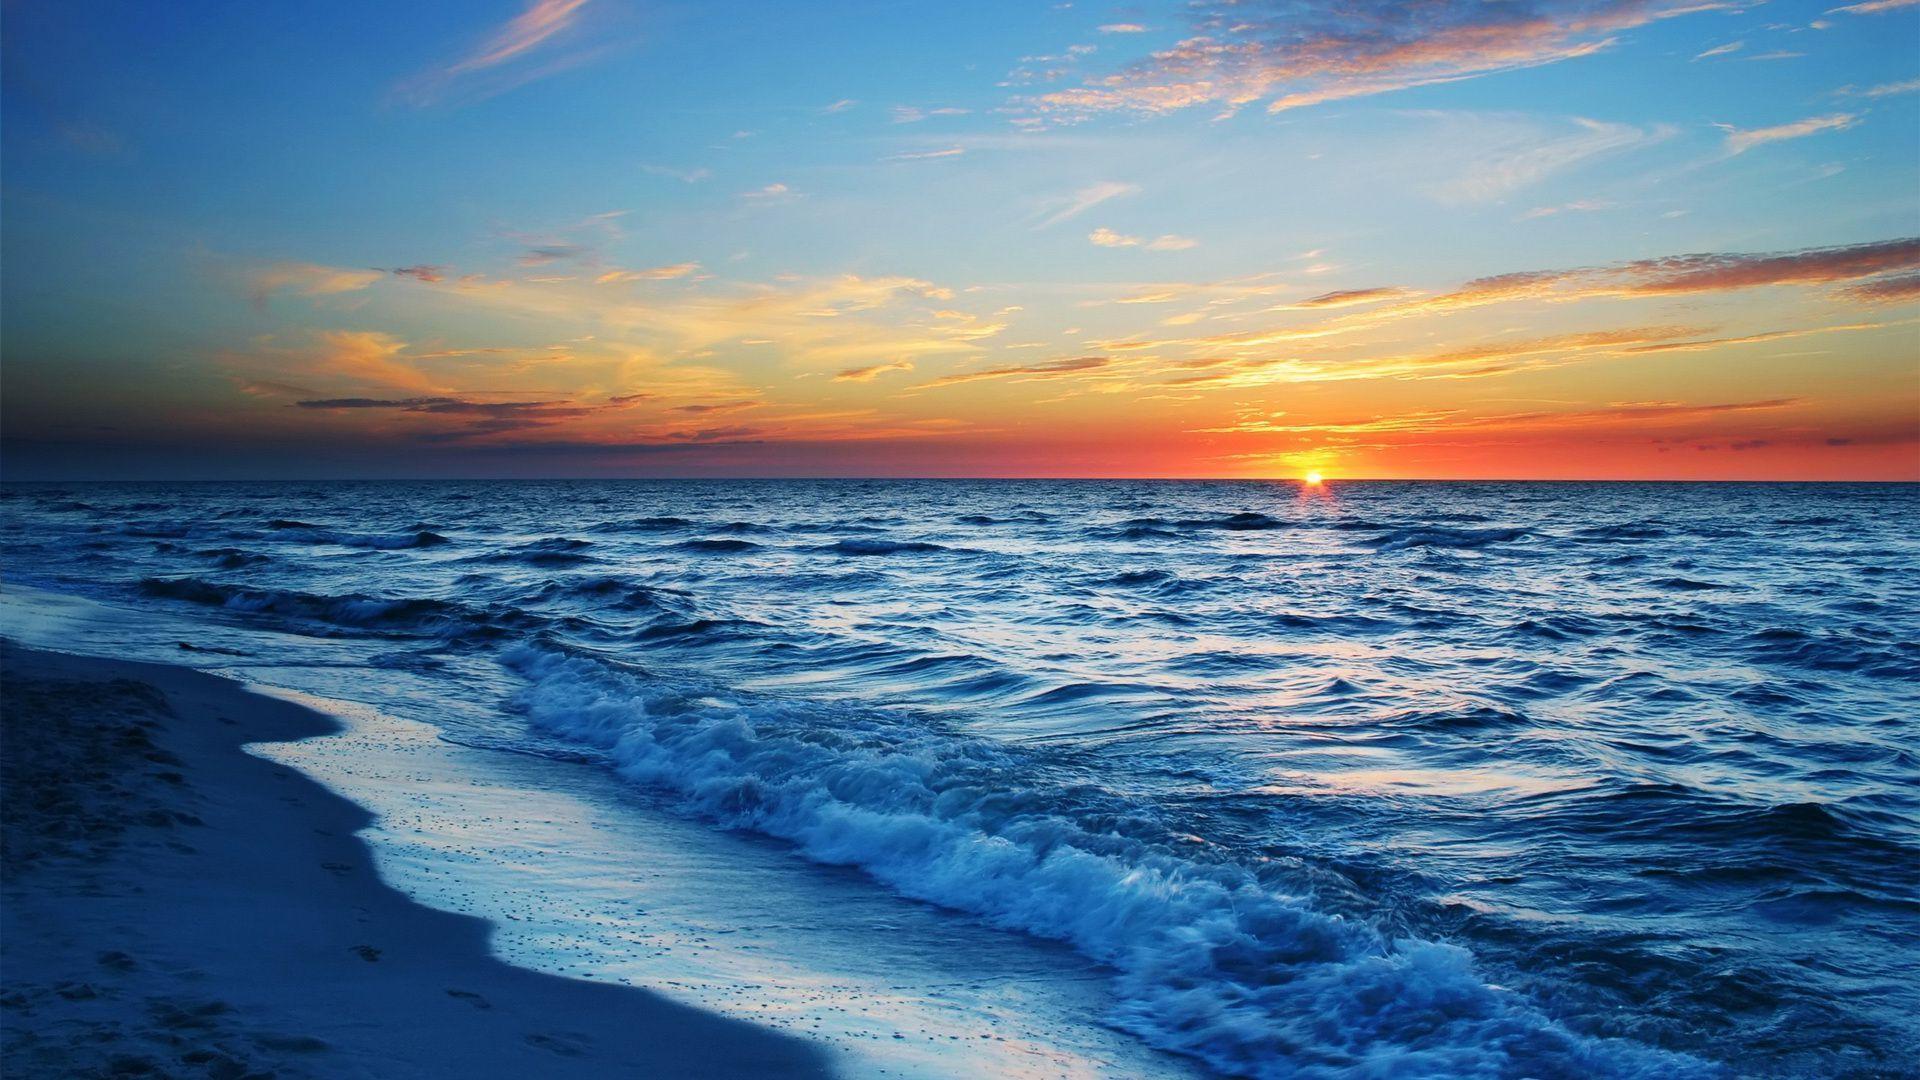 Ocean Sunset Background Wallpaper